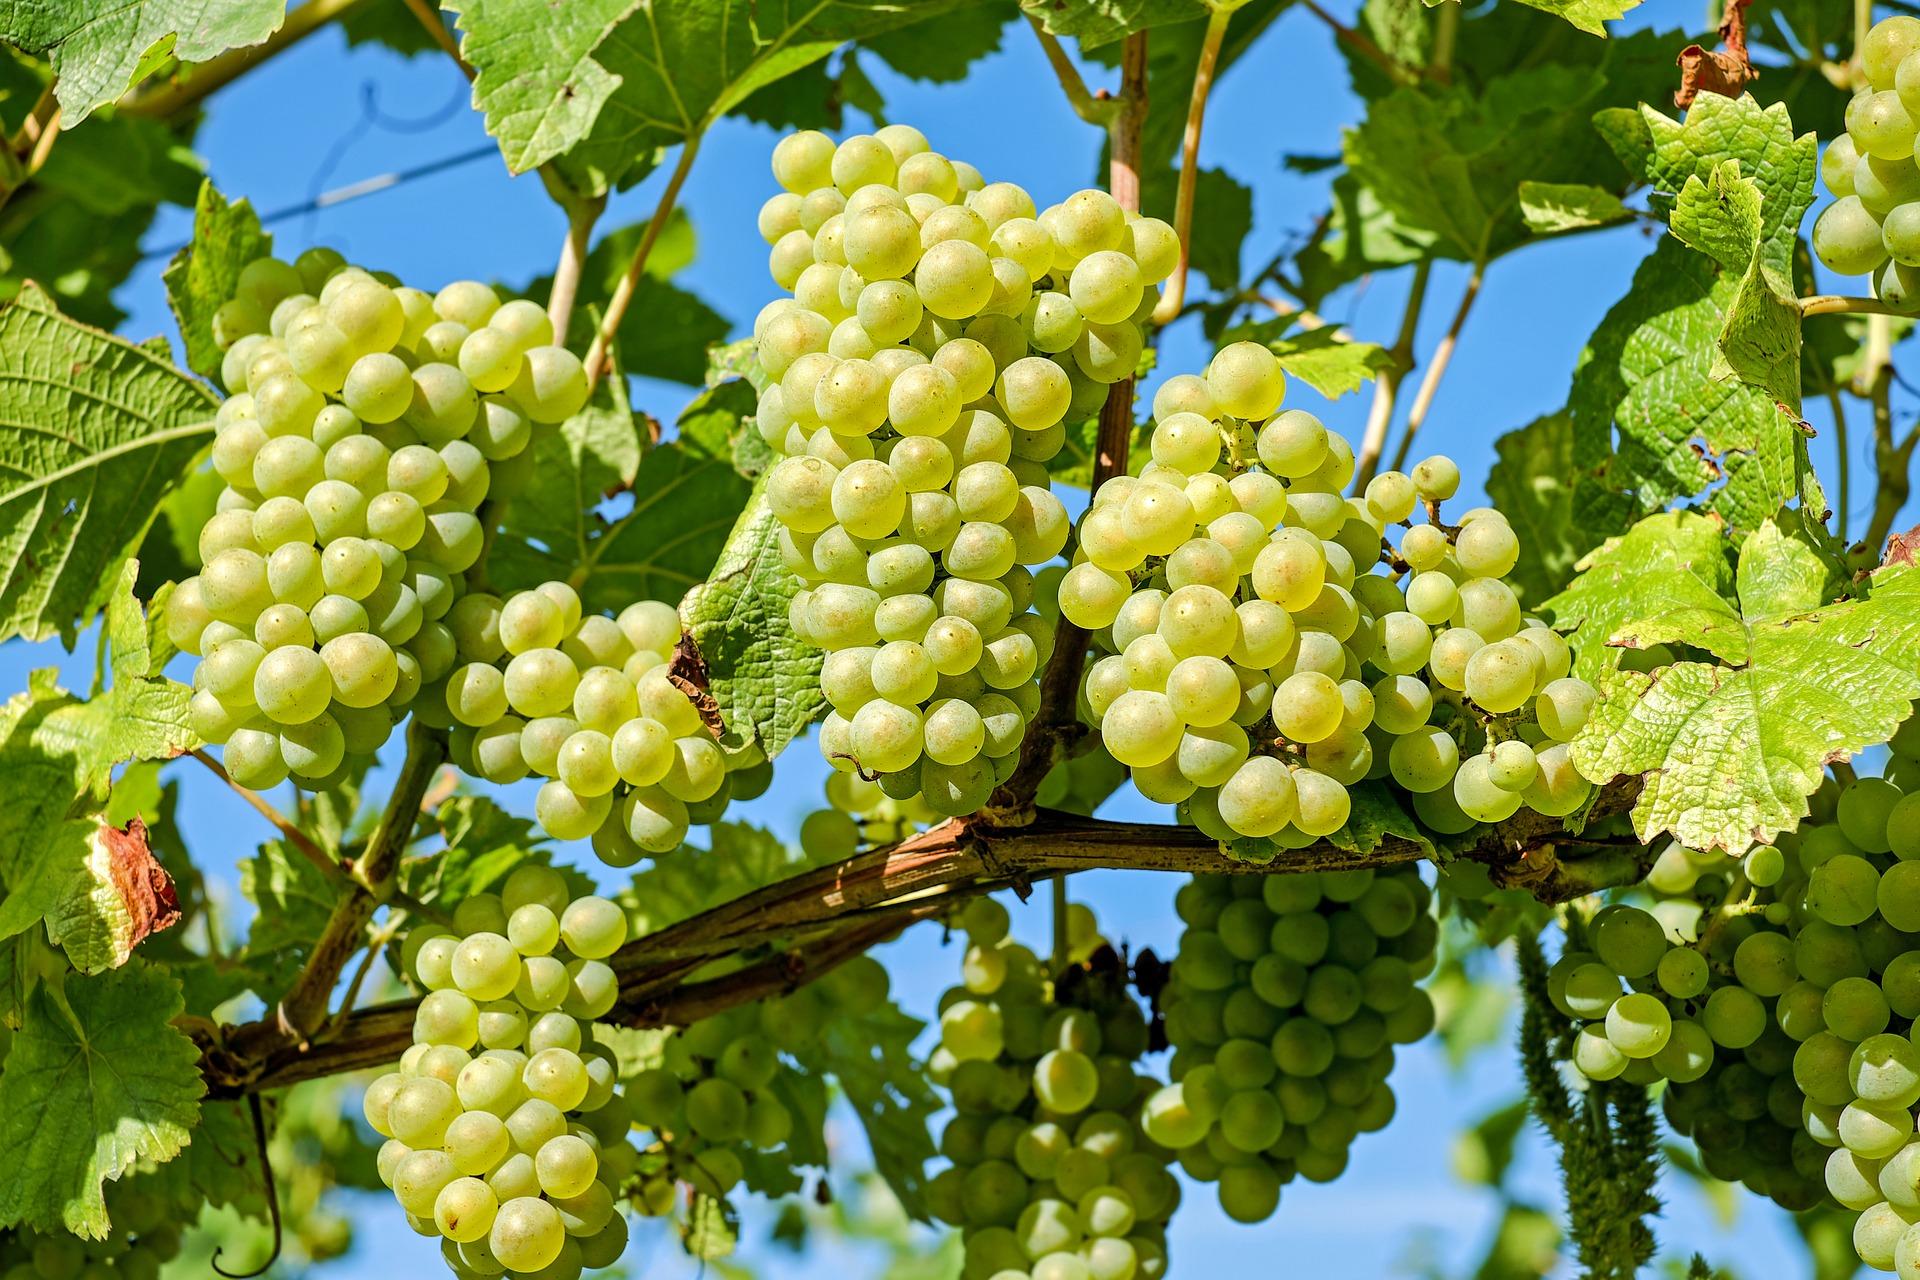 grapes-2656259-1920.jpg